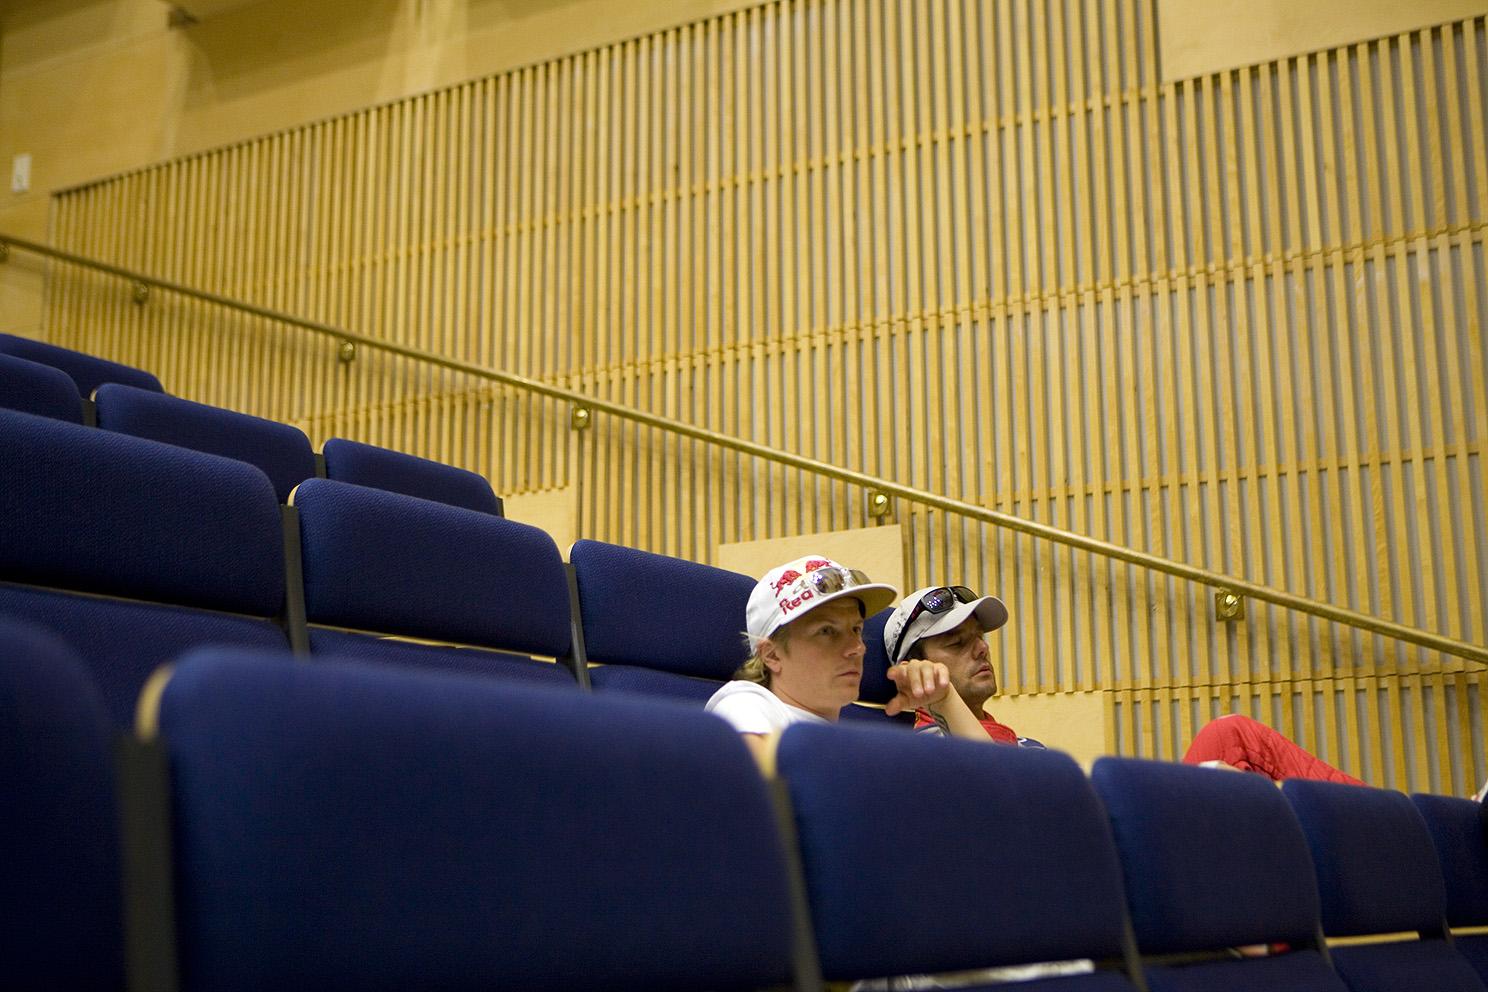 Kimi Raikkonen and Sebastien Loeb wait for the drivers meeting